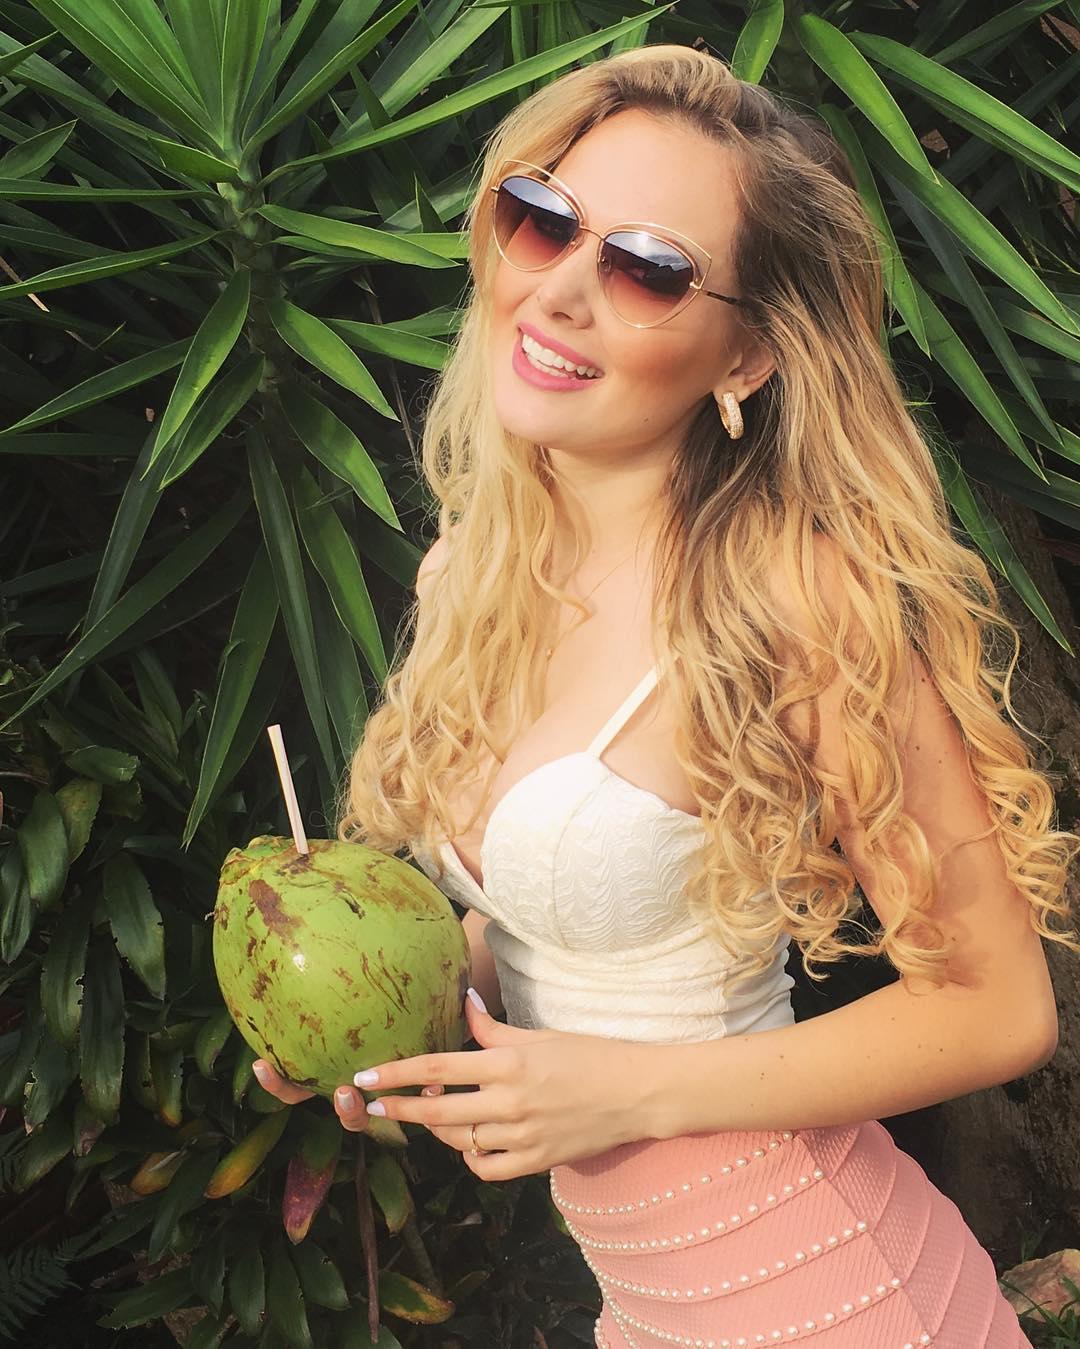 katherin strickert, miss megaverse 2018, 1st runner-up de supermodel international 2017. - Página 3 Icd3ke2s